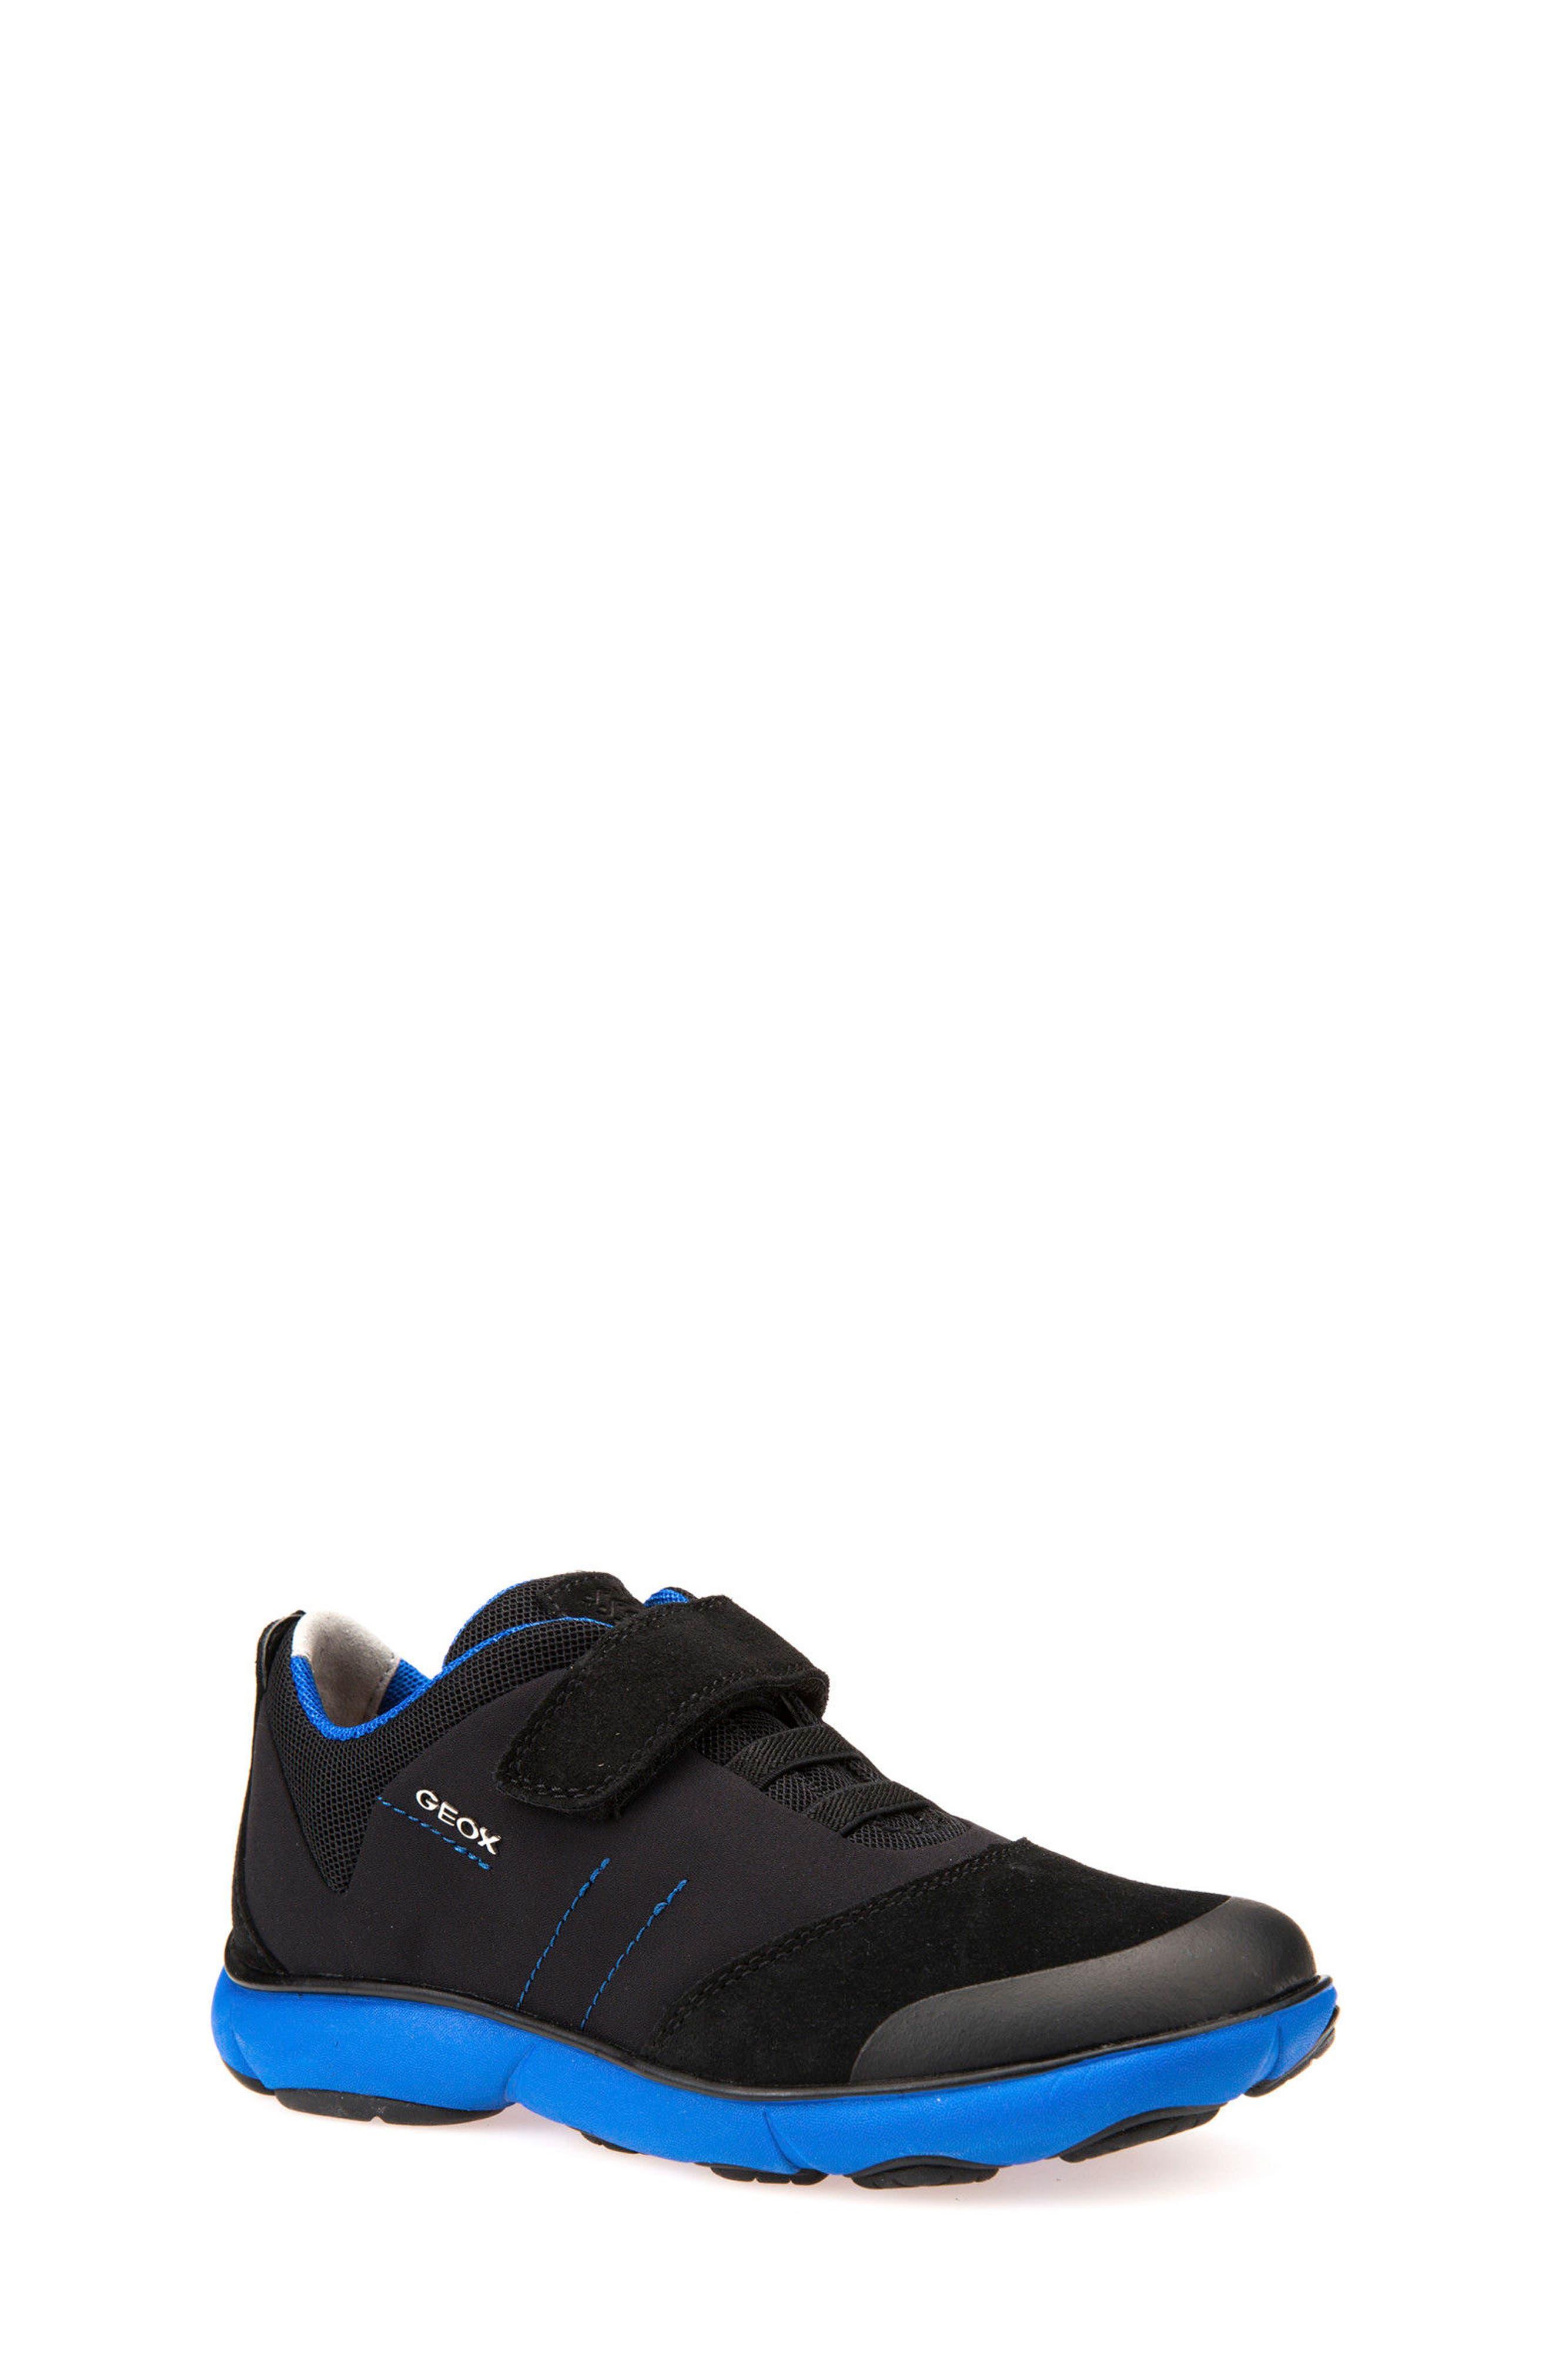 GEOX Nebula Low Top Sneaker, Main, color, 009